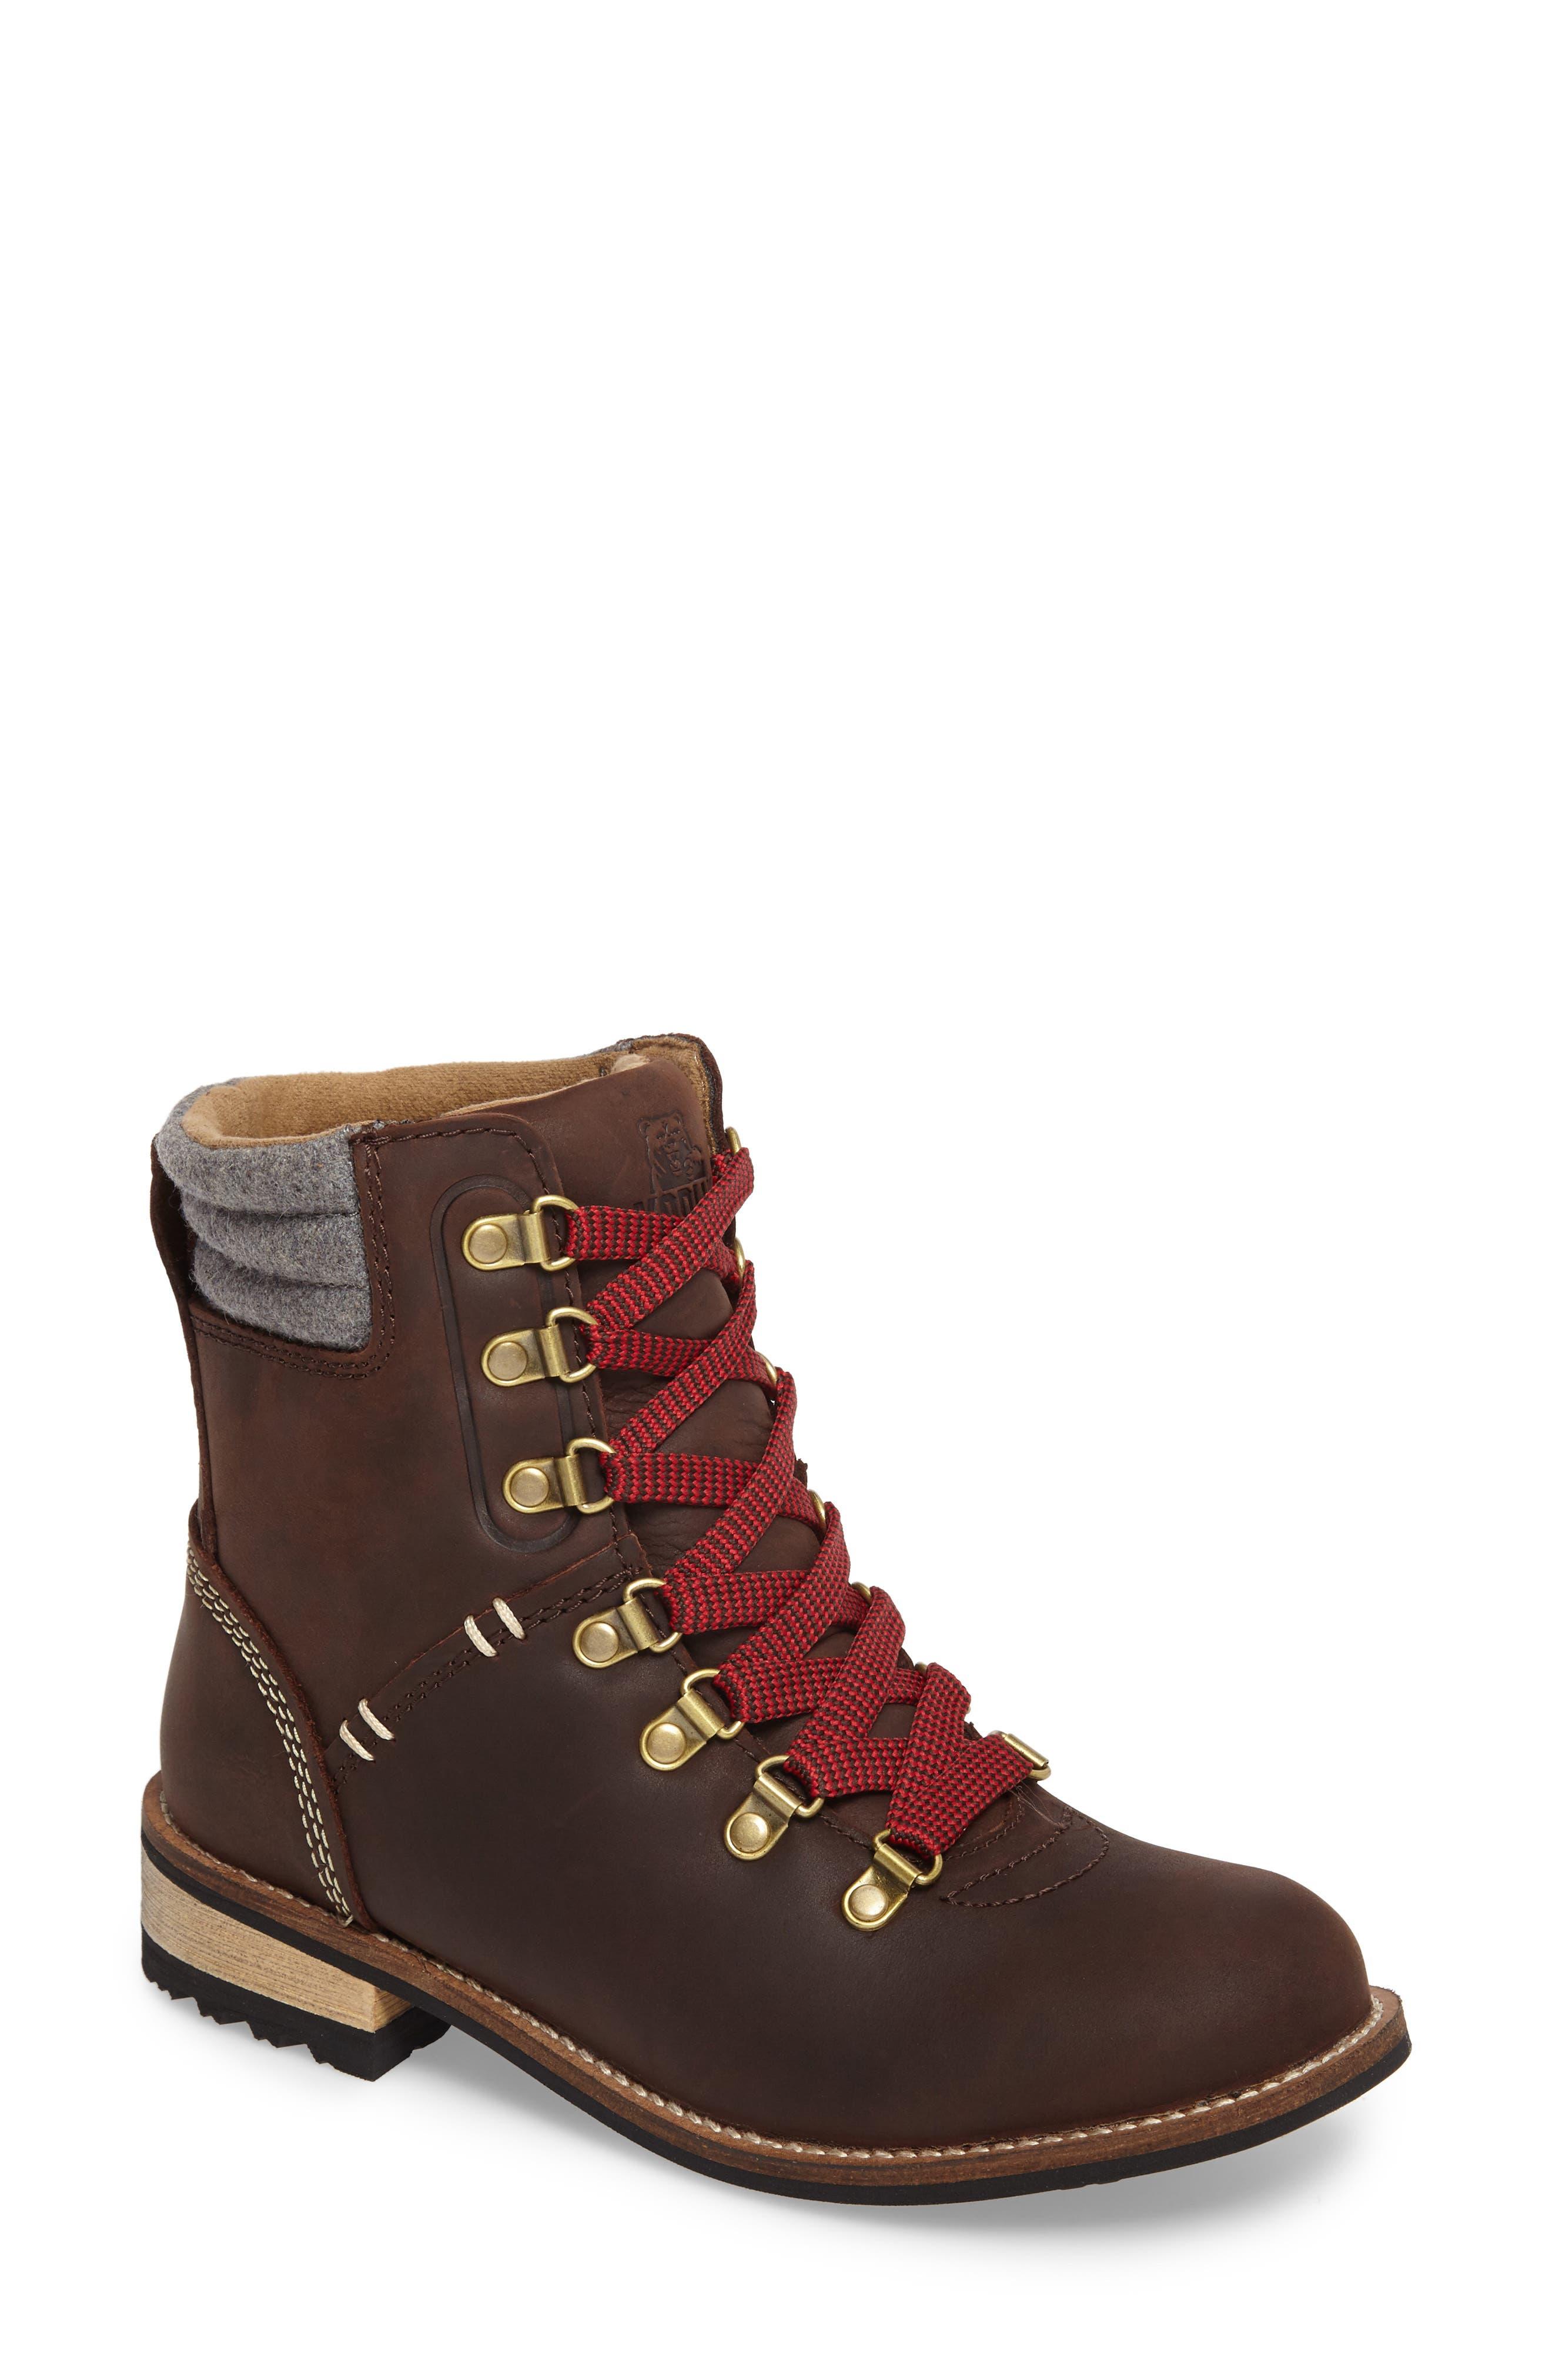 Surrey II Waterproof Boot,                         Main,                         color, Brown Leather